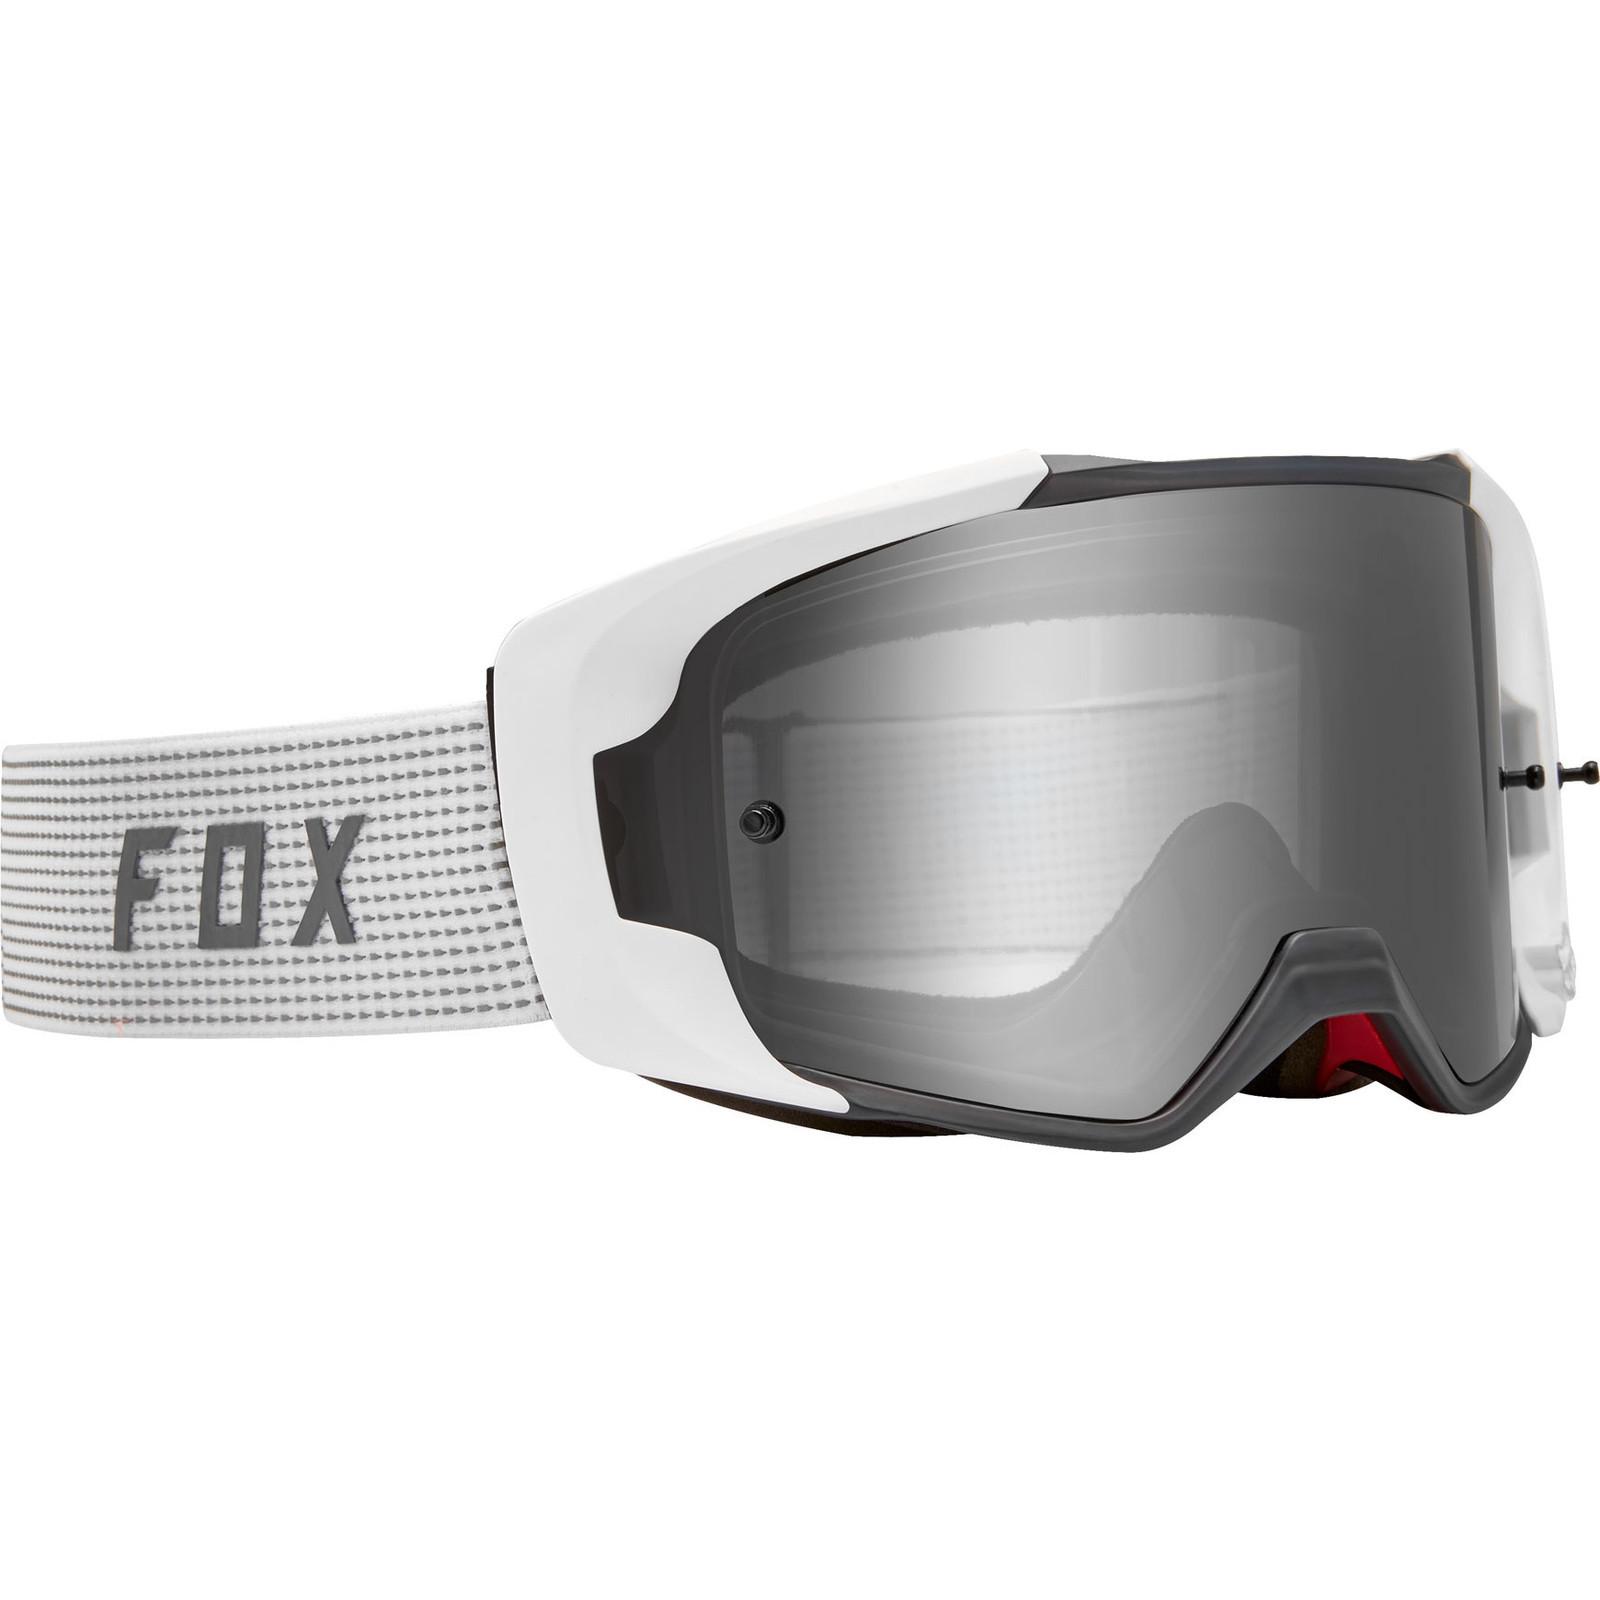 Fox Racing Vue Motocross Goggles Adventure Enduro Off Road Dirt Quad Bike MX ATV